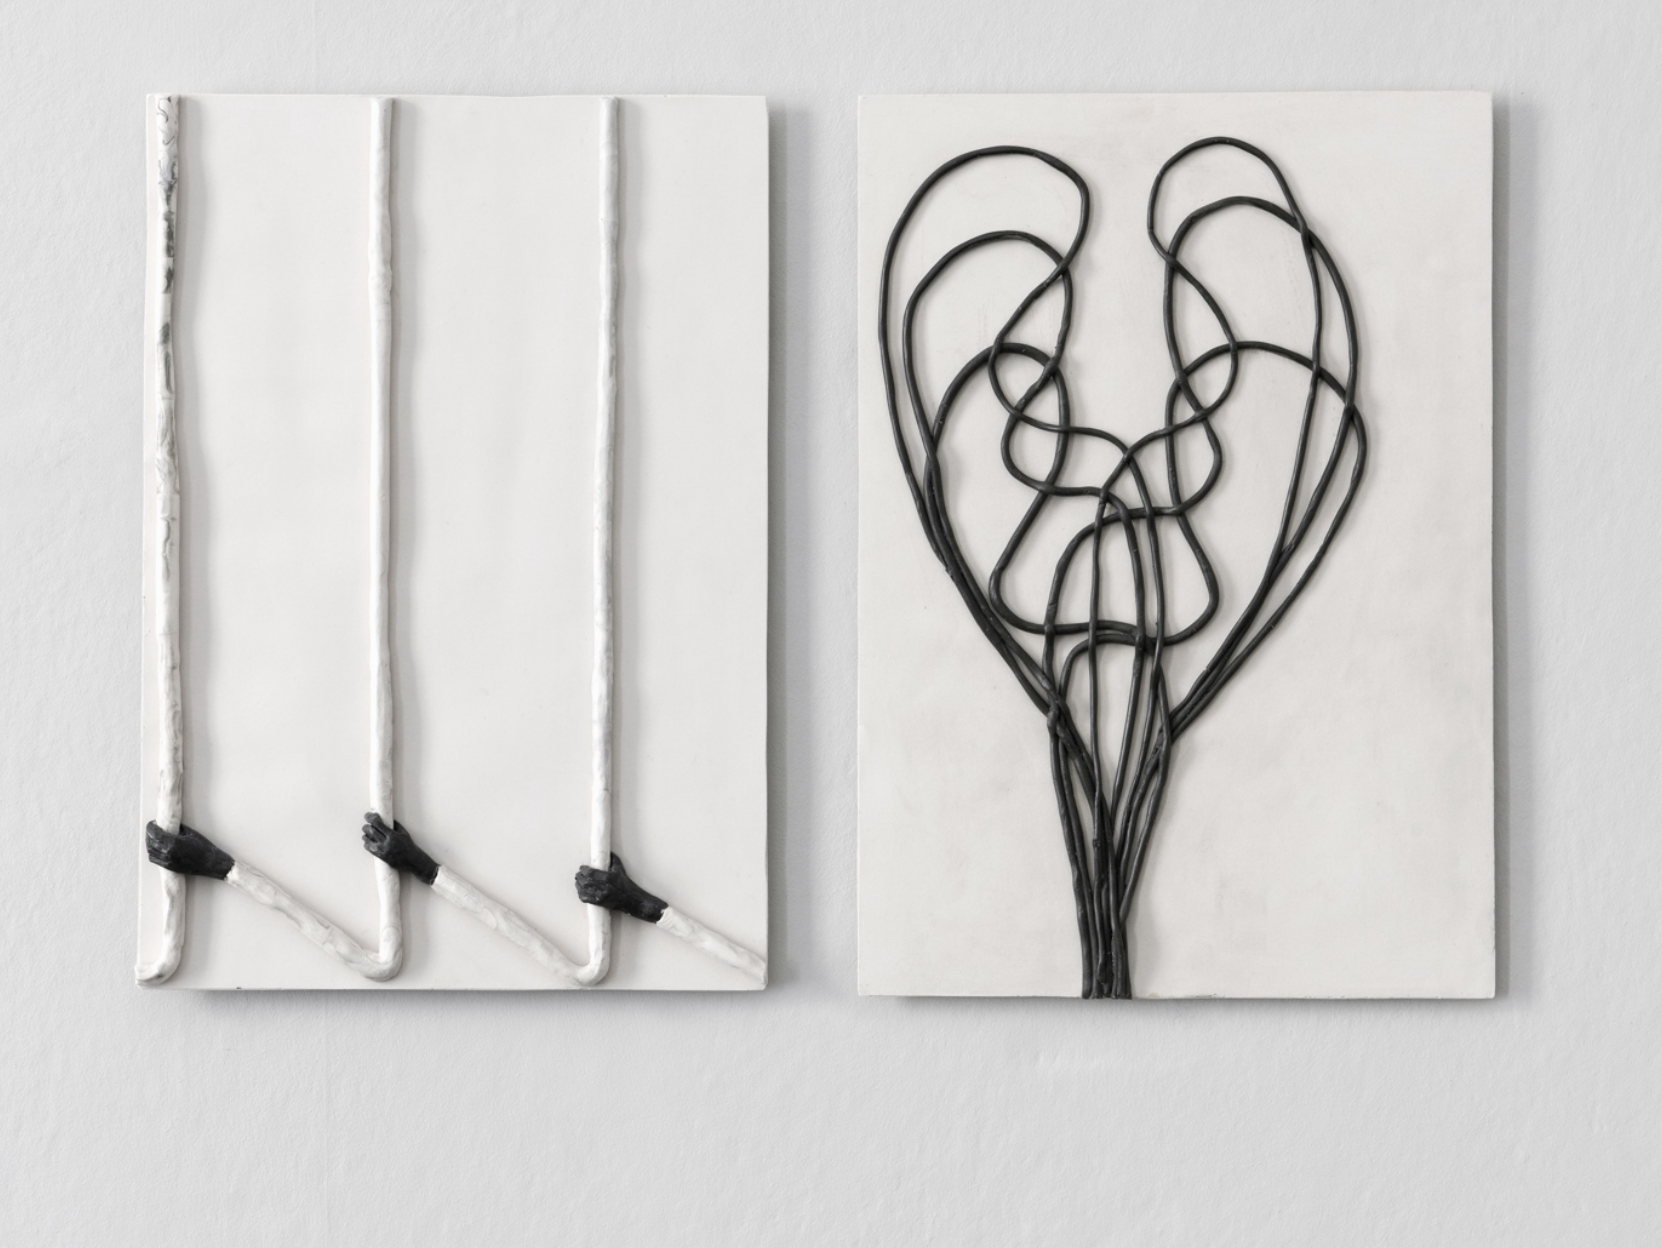 Enrico David   Untitled , 2014 Jesmonite, pigment, fibre tissue Cast 1 from an edition of 5 + 2 aps 42 x 30 x 2 cm